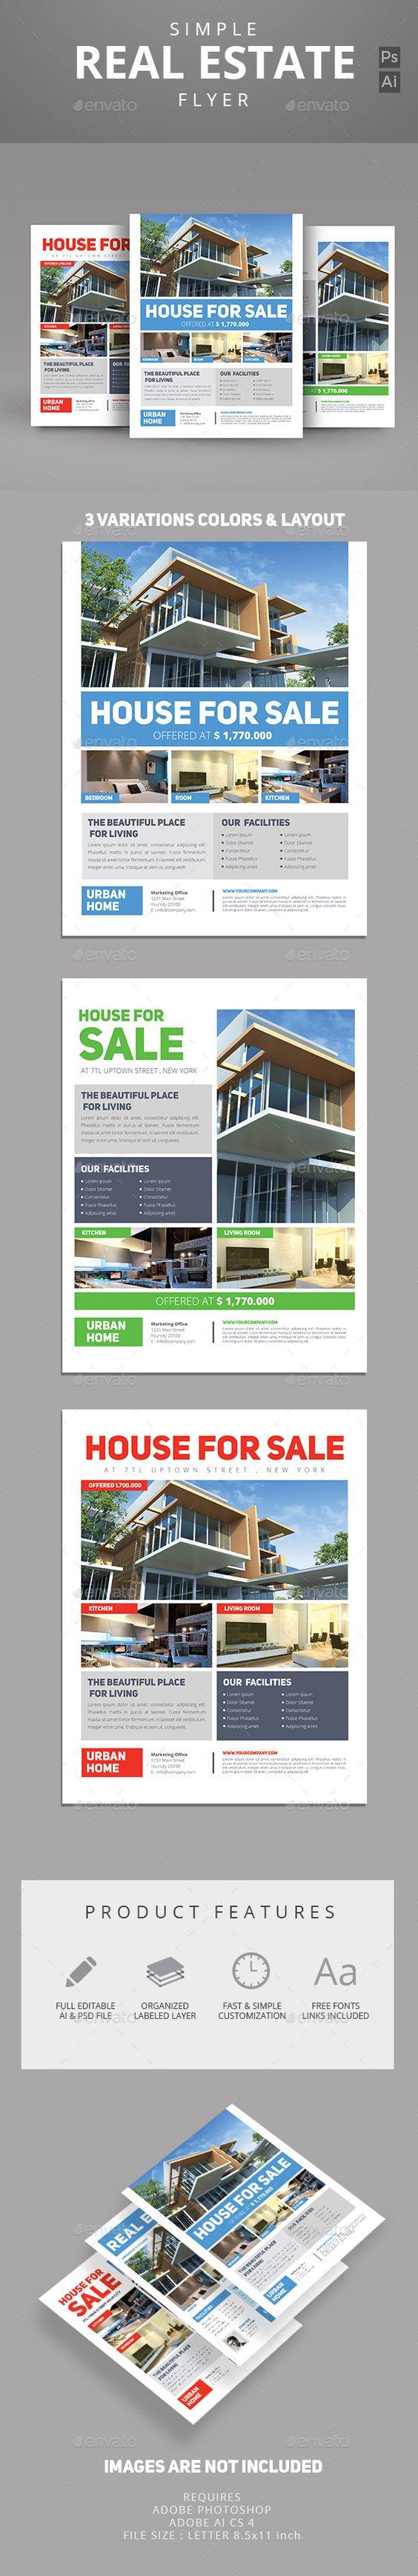 simple real estate flyer design flyer design and simple this real estate flyer template can be used for promote your property product interior design etc features us let